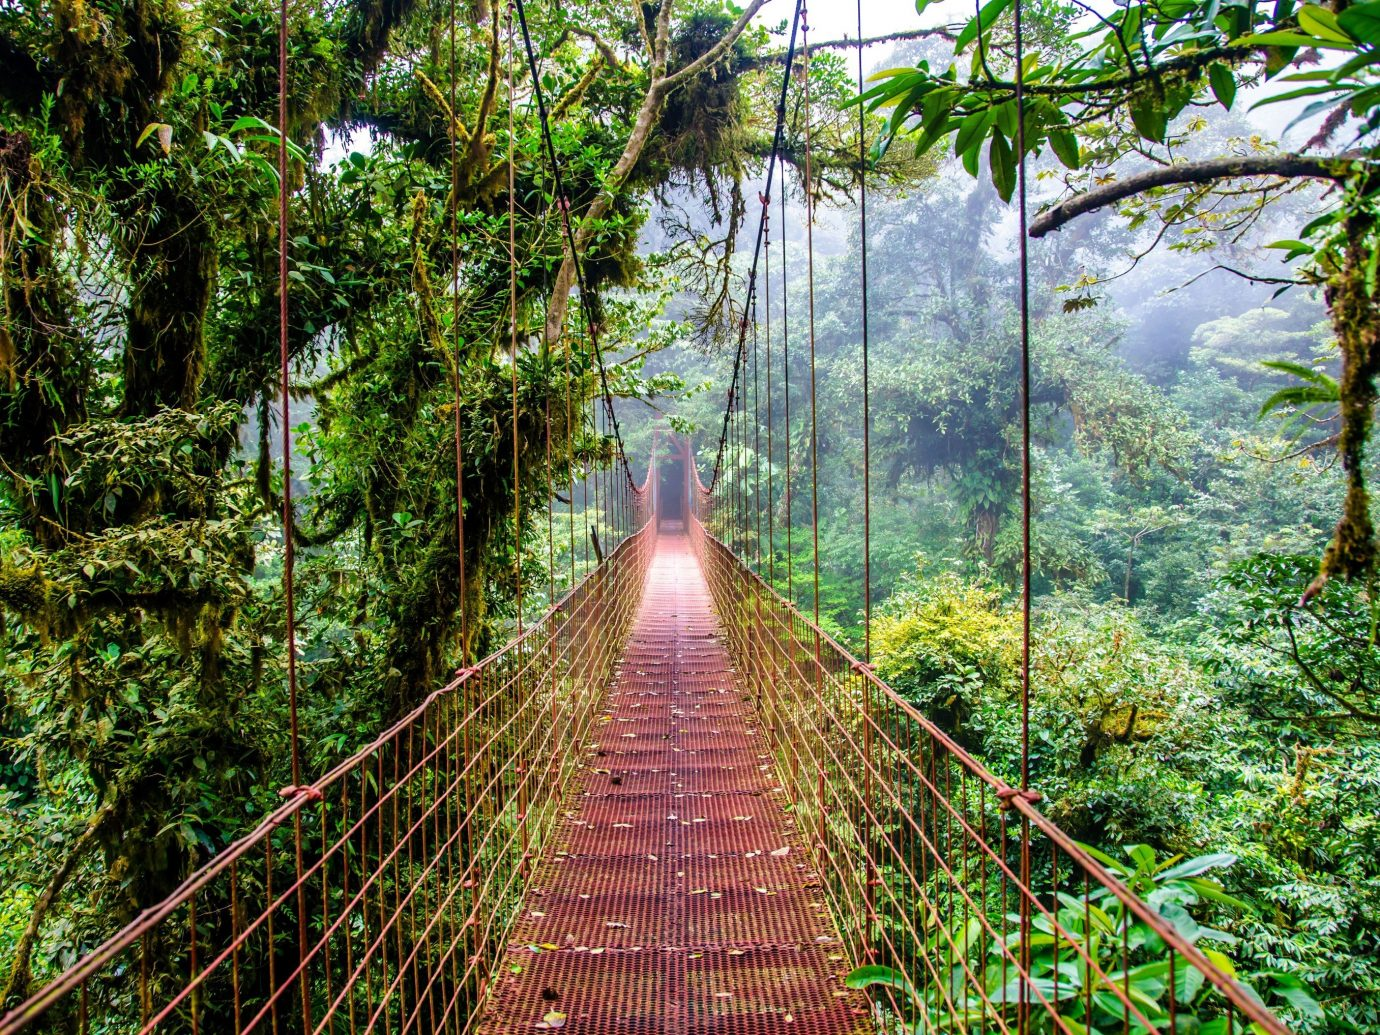 Trip Ideas tree outdoor habitat building bridge vegetation Nature rainforest natural environment Forest old growth forest botany Jungle woodland tropics plantation wooded surrounded lush